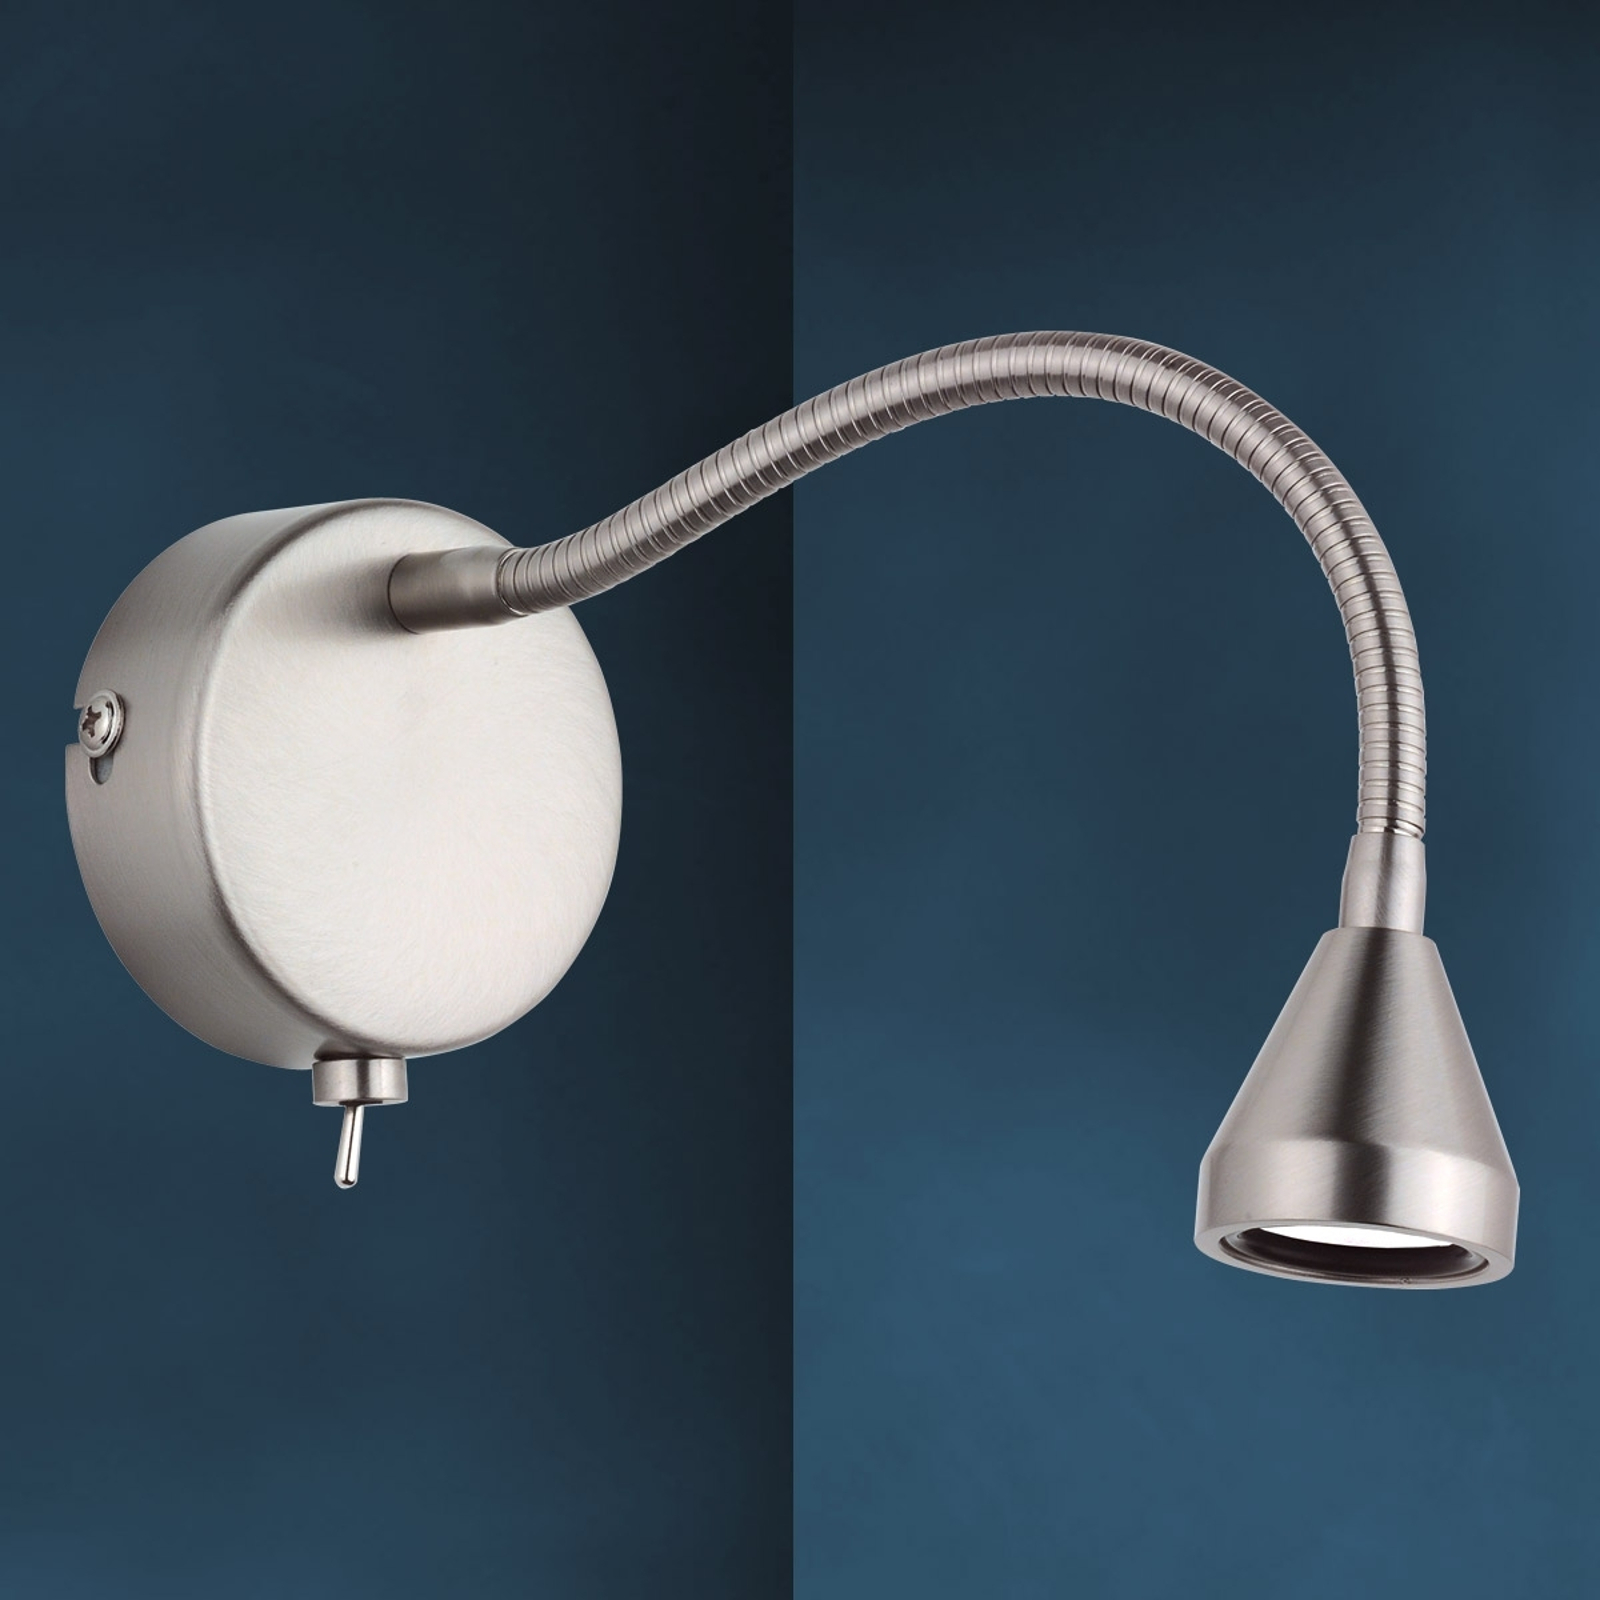 Aplique LED MINI, brazo flexible, blanco universal